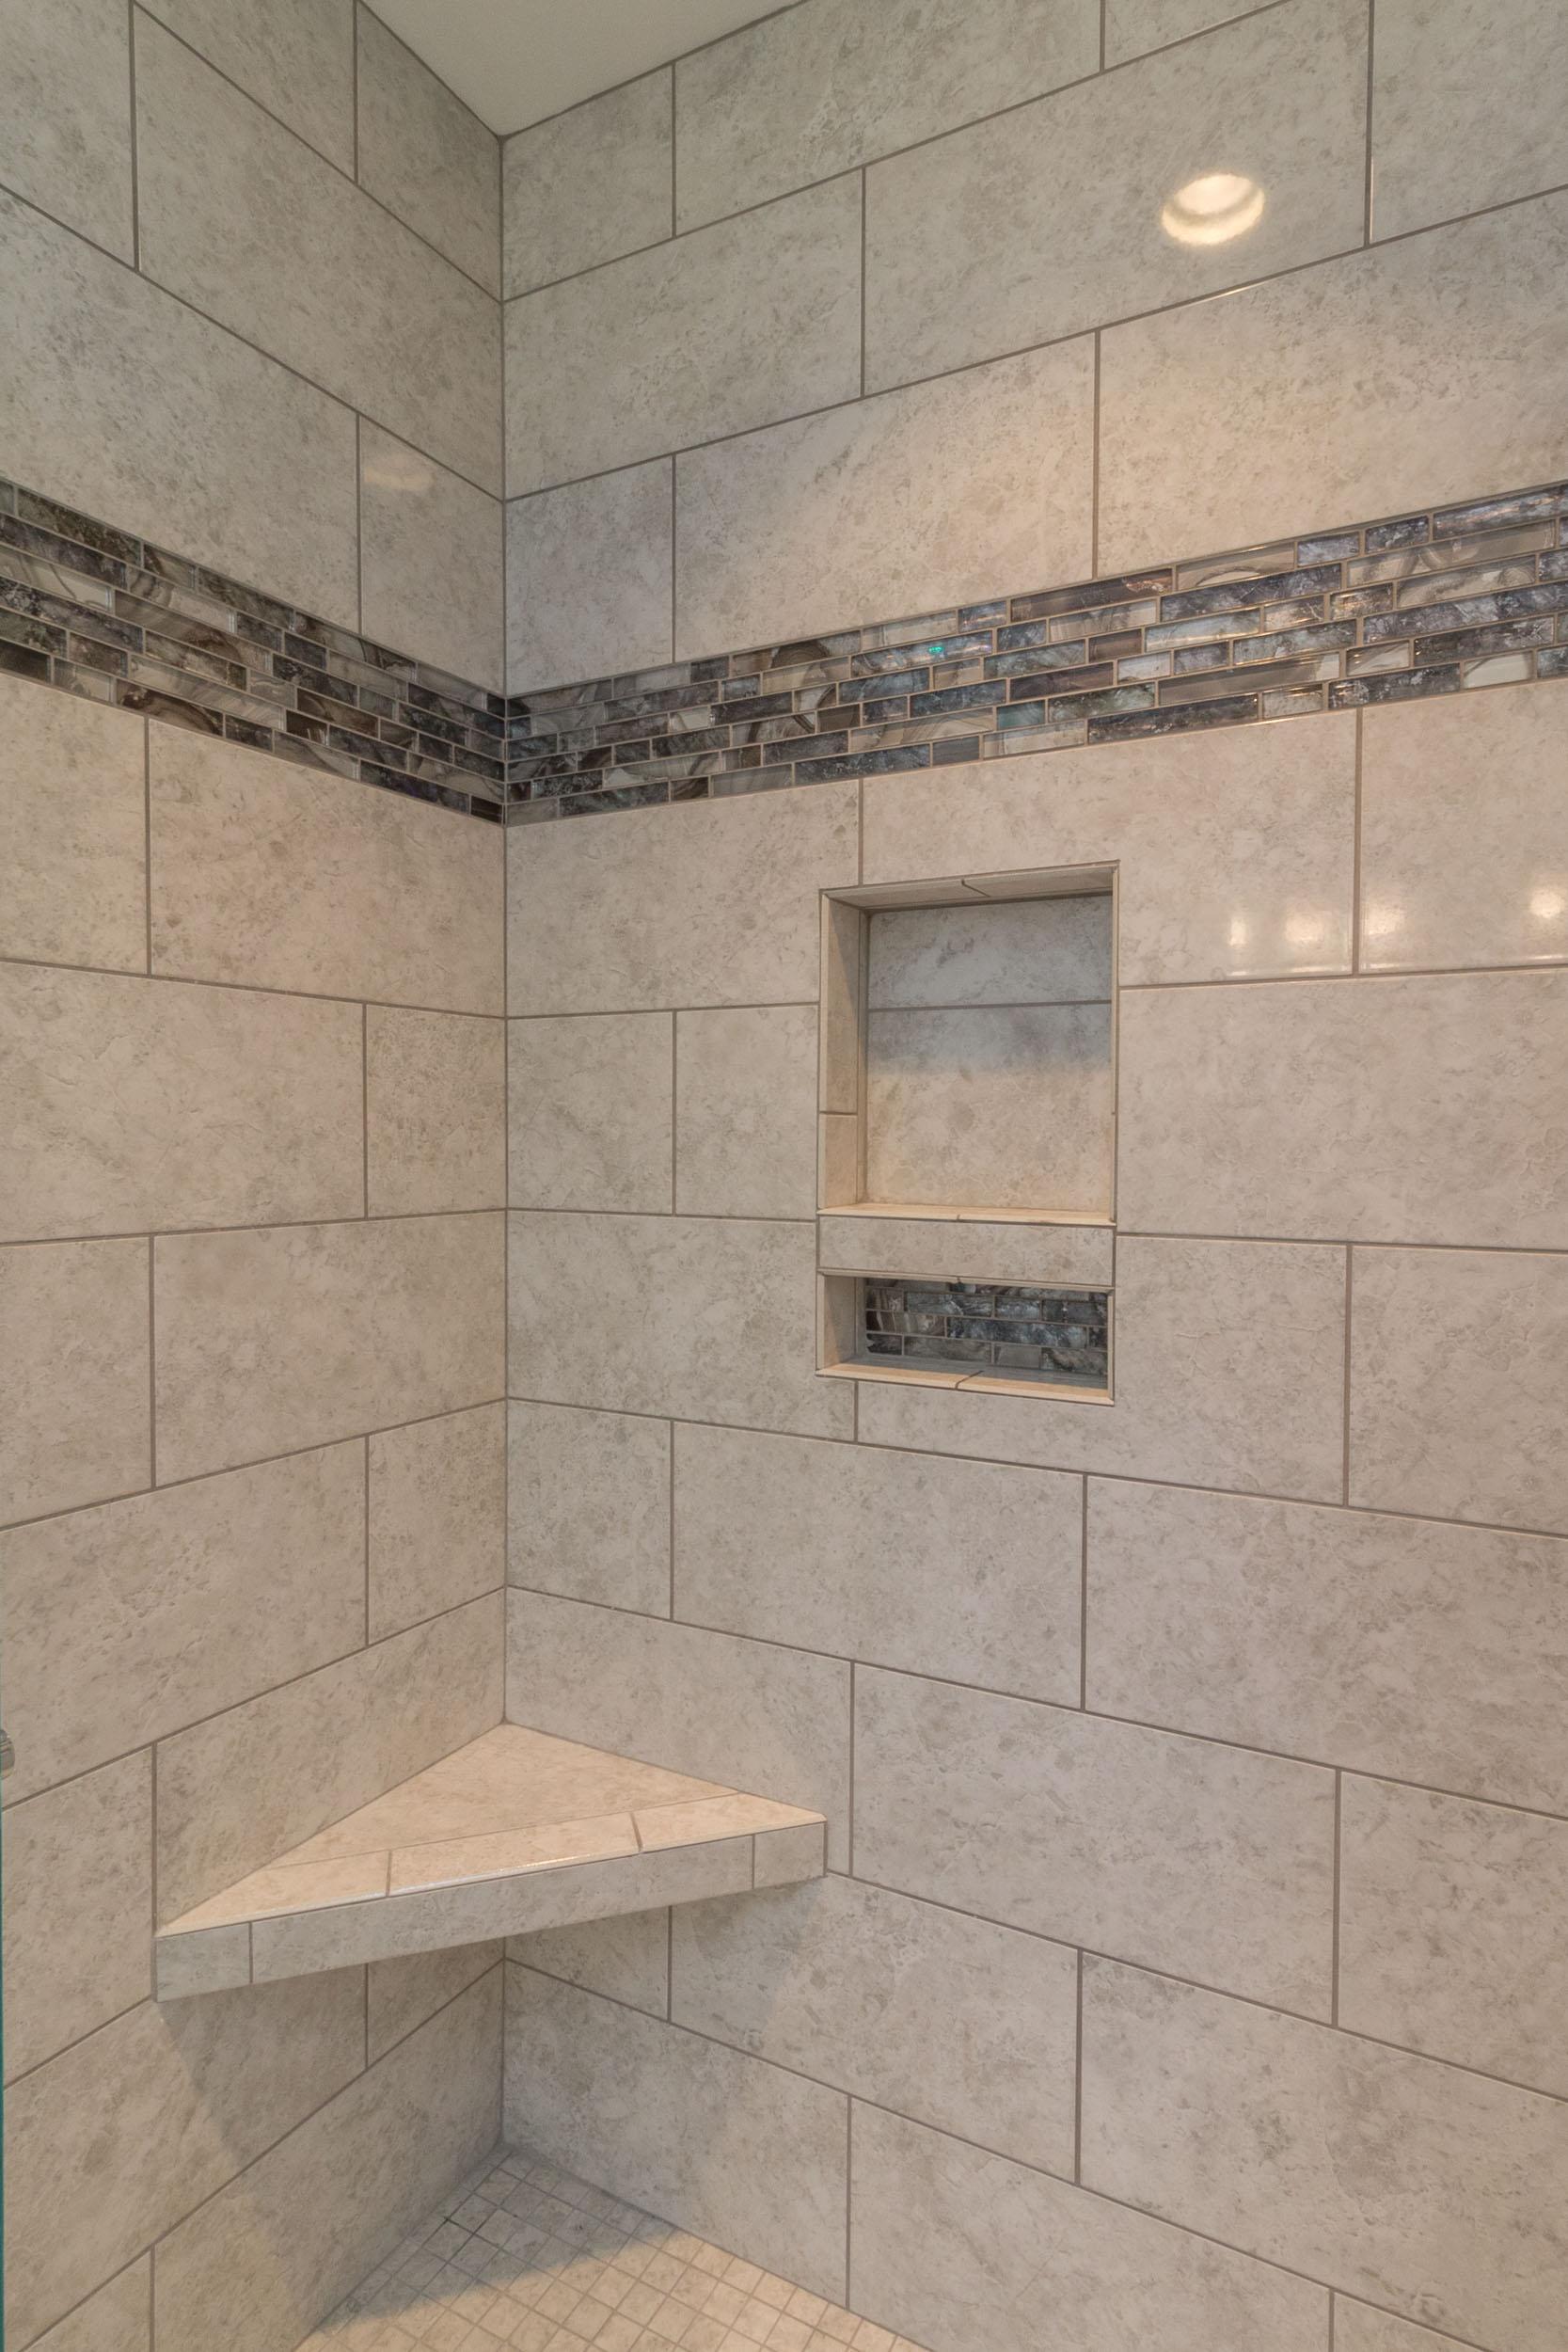 Bathroom Remodeling - A Custom Walk-in Shower